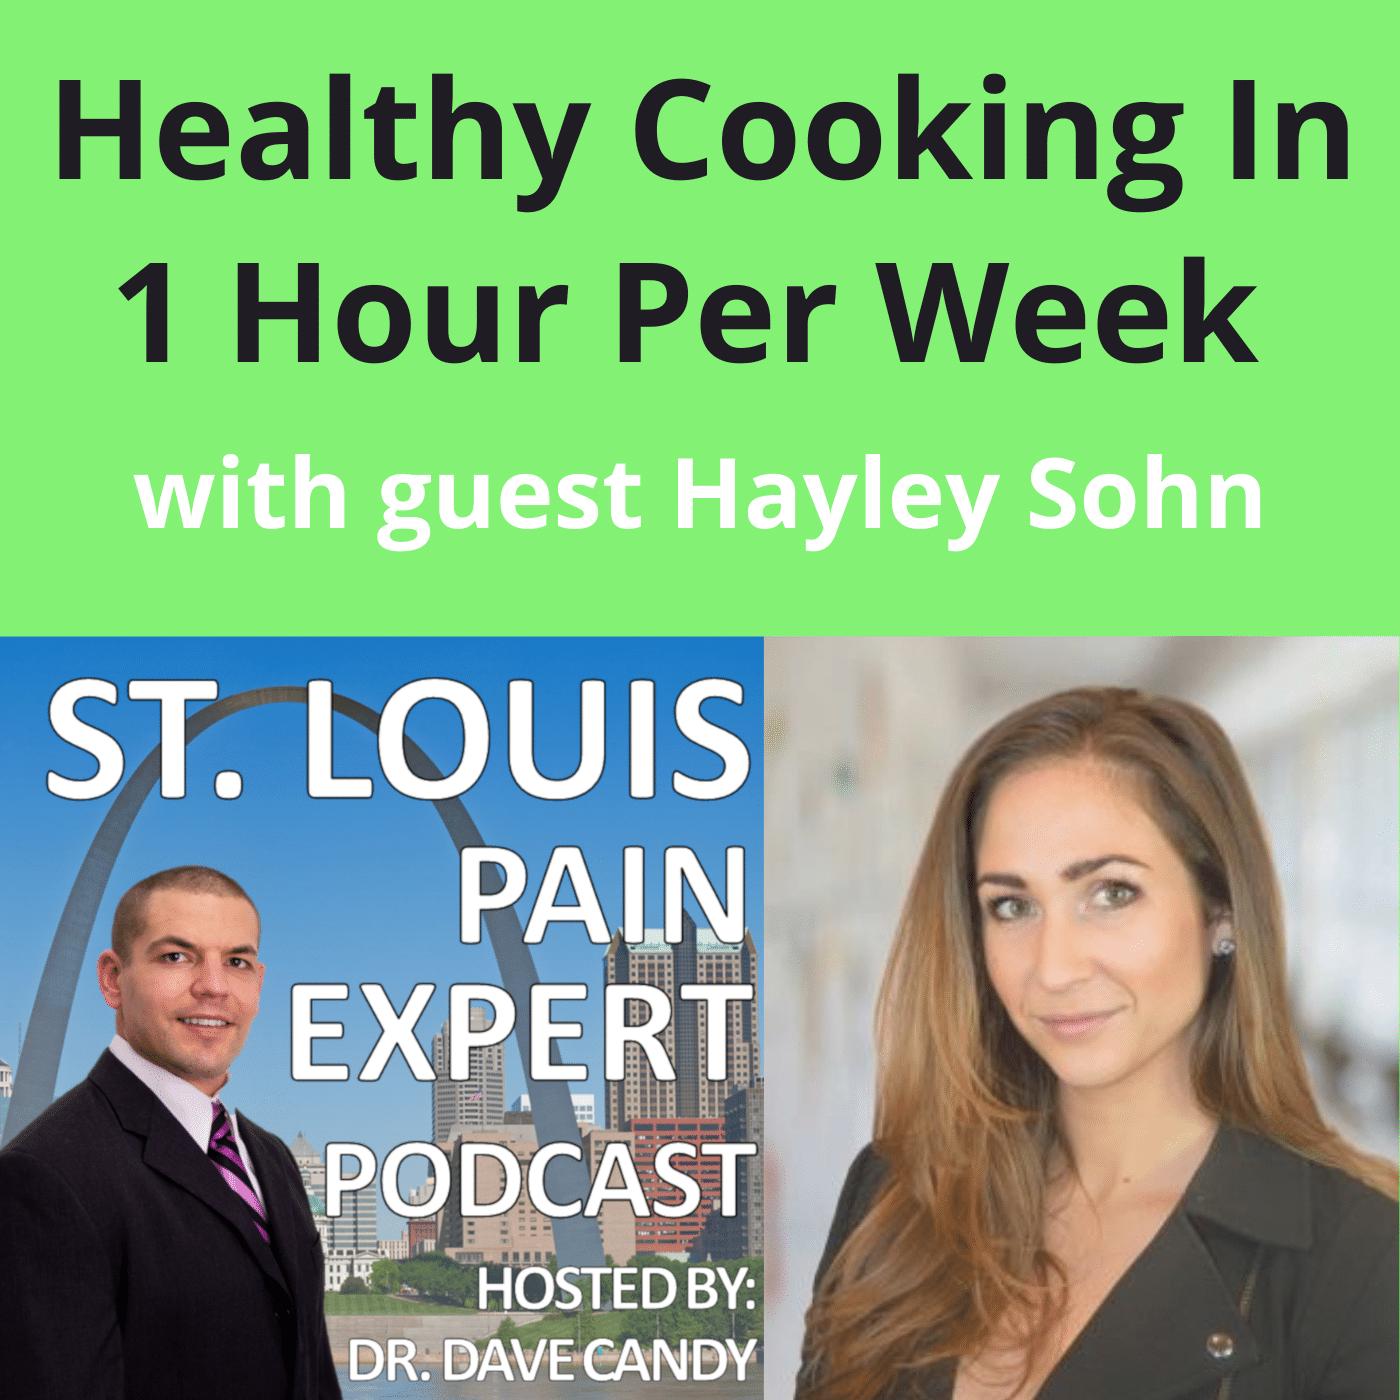 Healthy Cooking In 1 Hour Per Week with guest Hayley Sohn